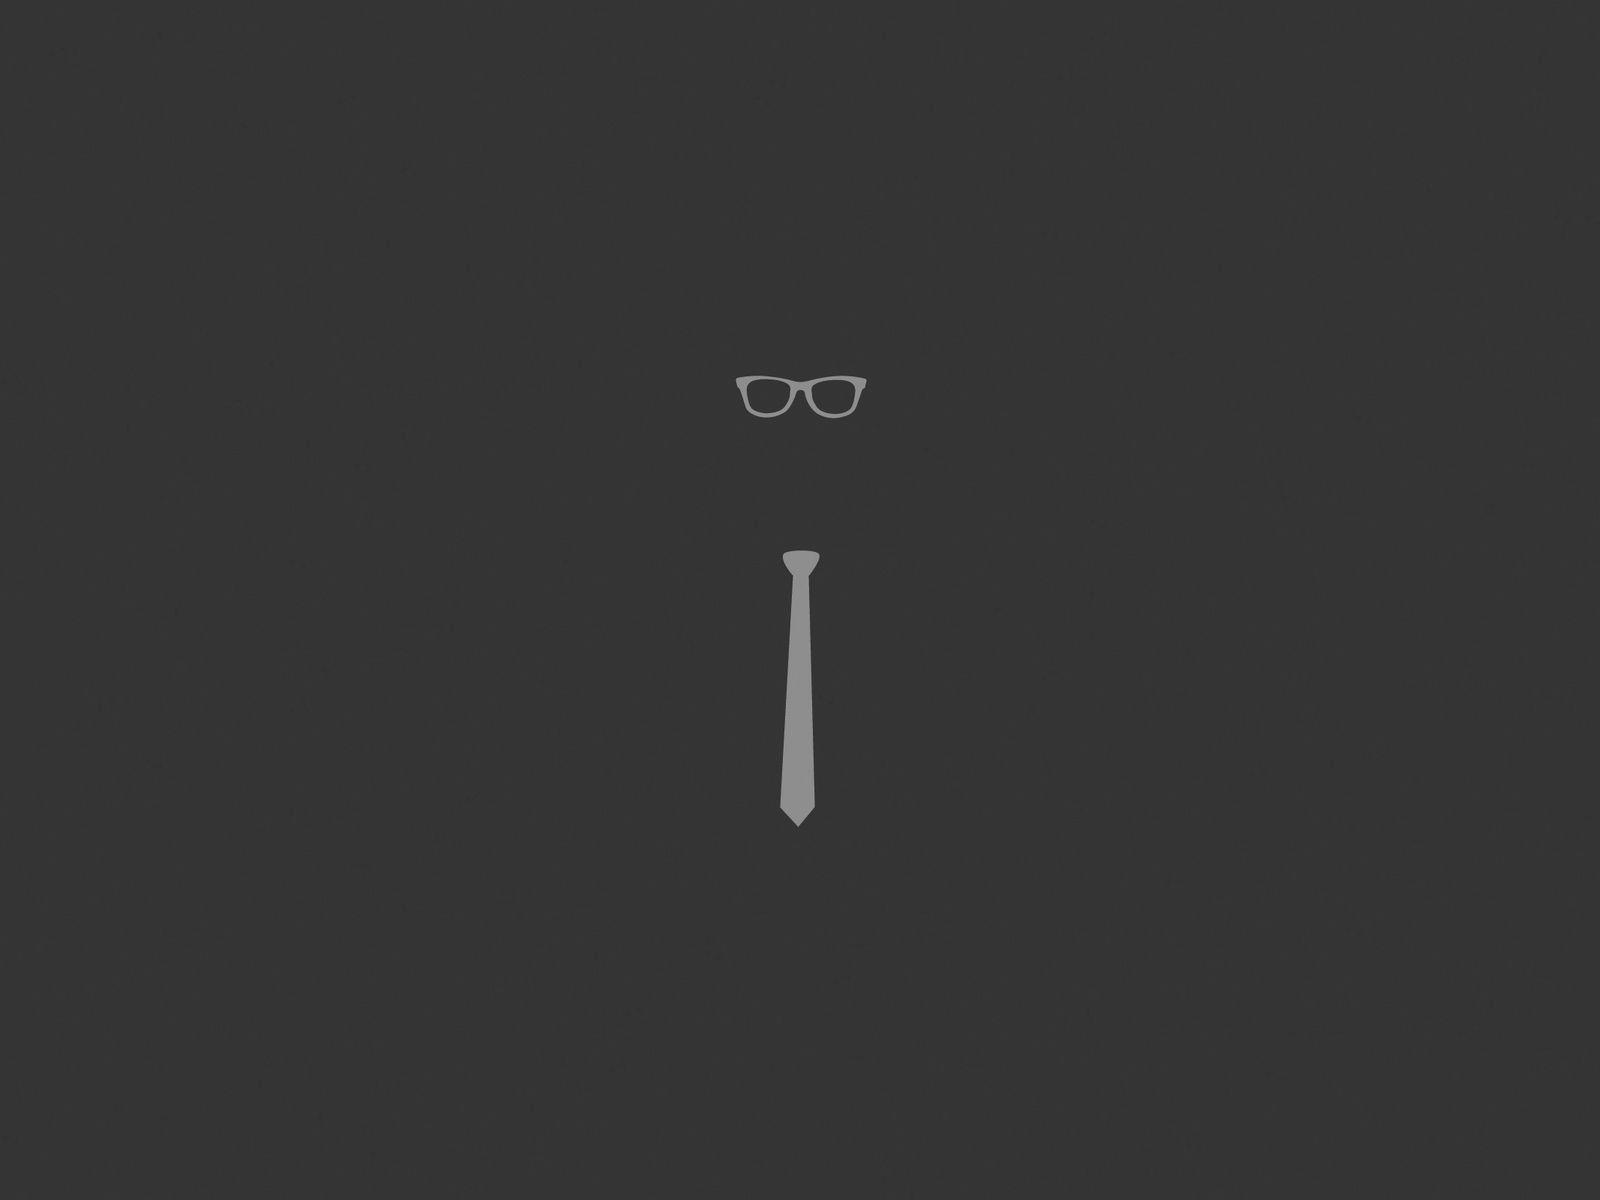 1600x1200 Wallpaper tie, glasses, graphic, minimalist